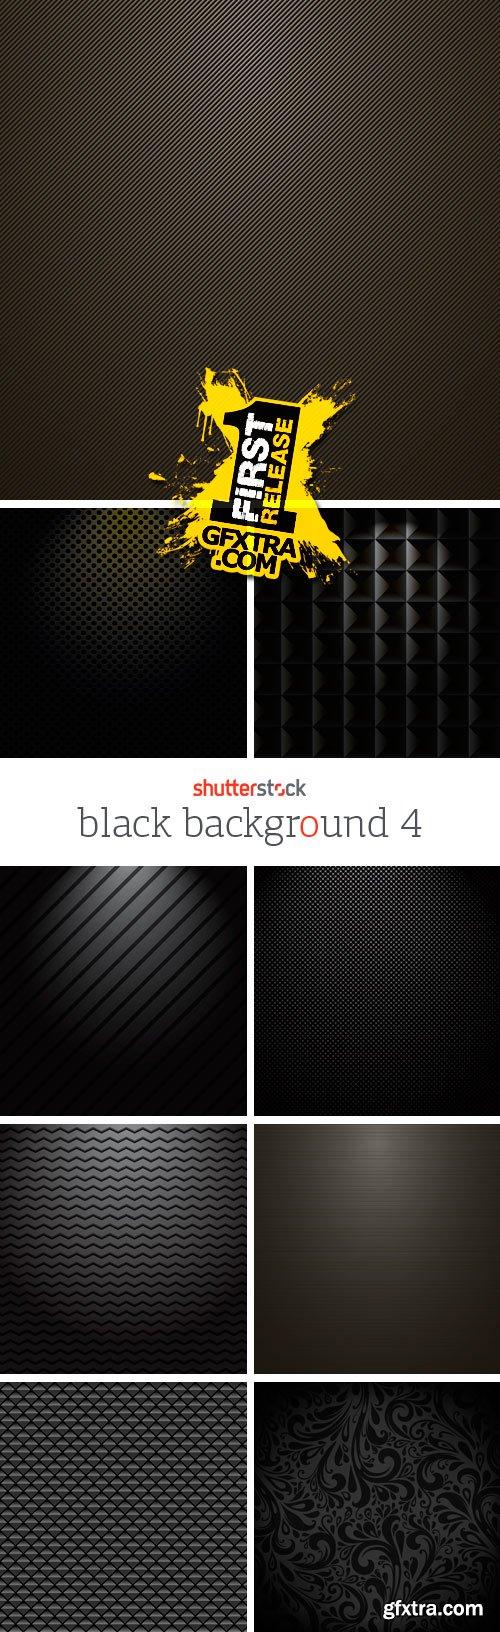 Amazing SS - Black Background (vol.4), 25xEPS